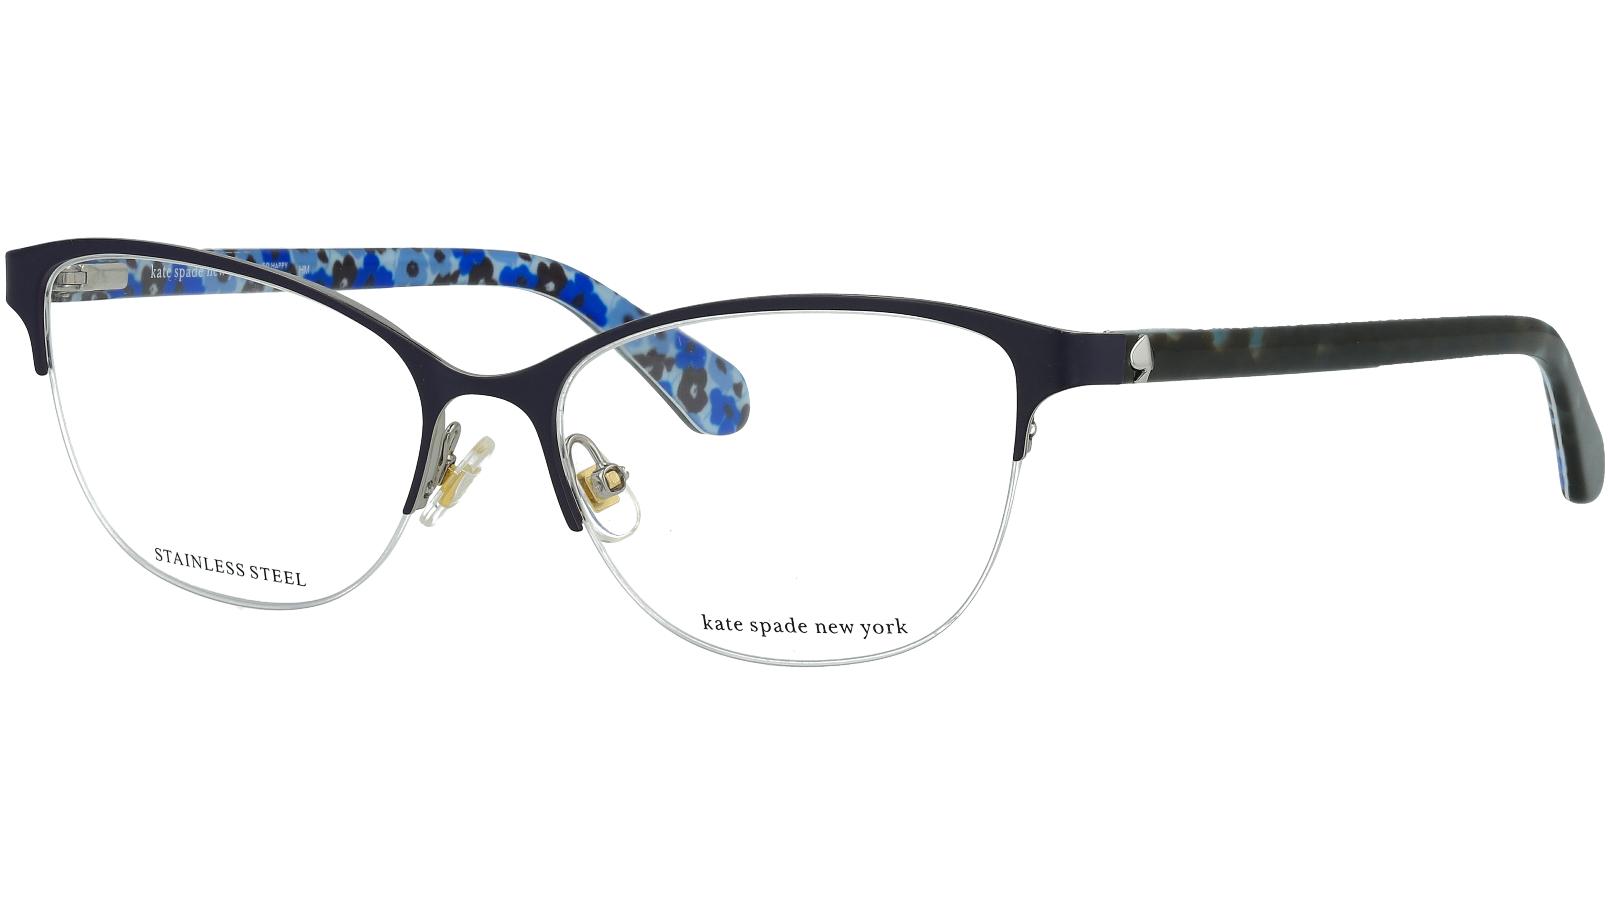 KATE SPADE ADALINA F2G 53 BLUE Glasses